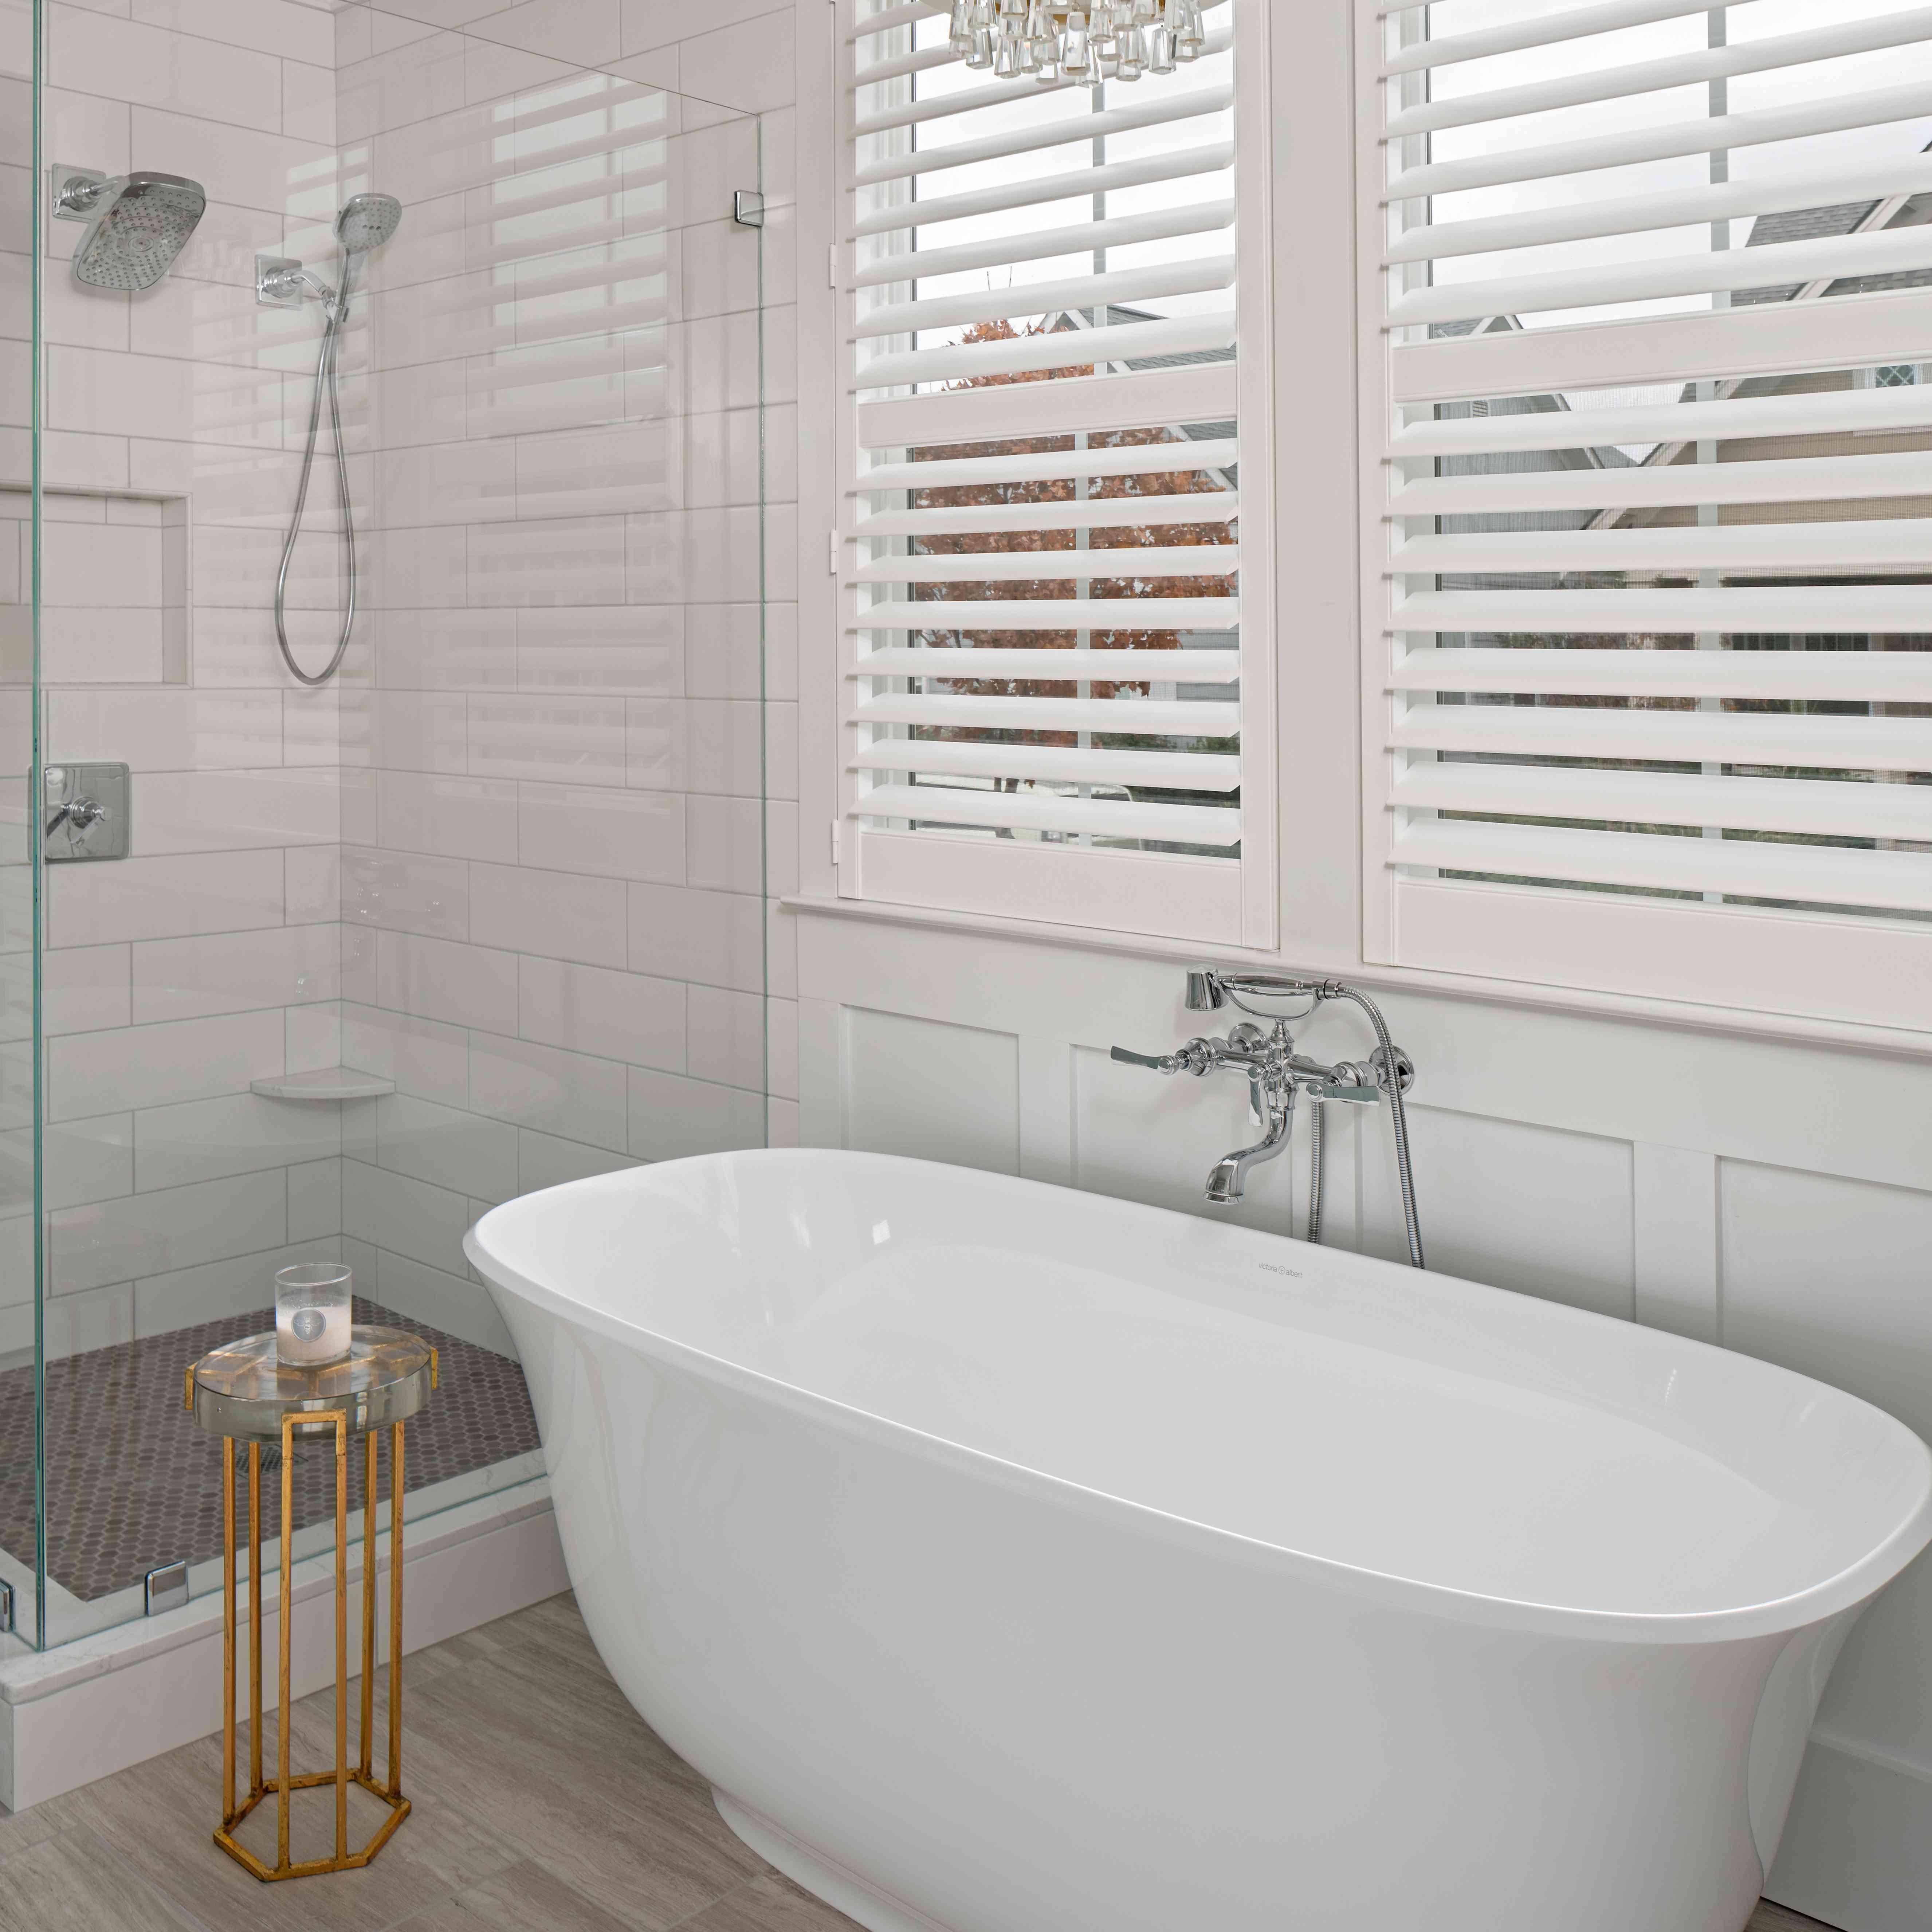 Elegant white tub with chandelier